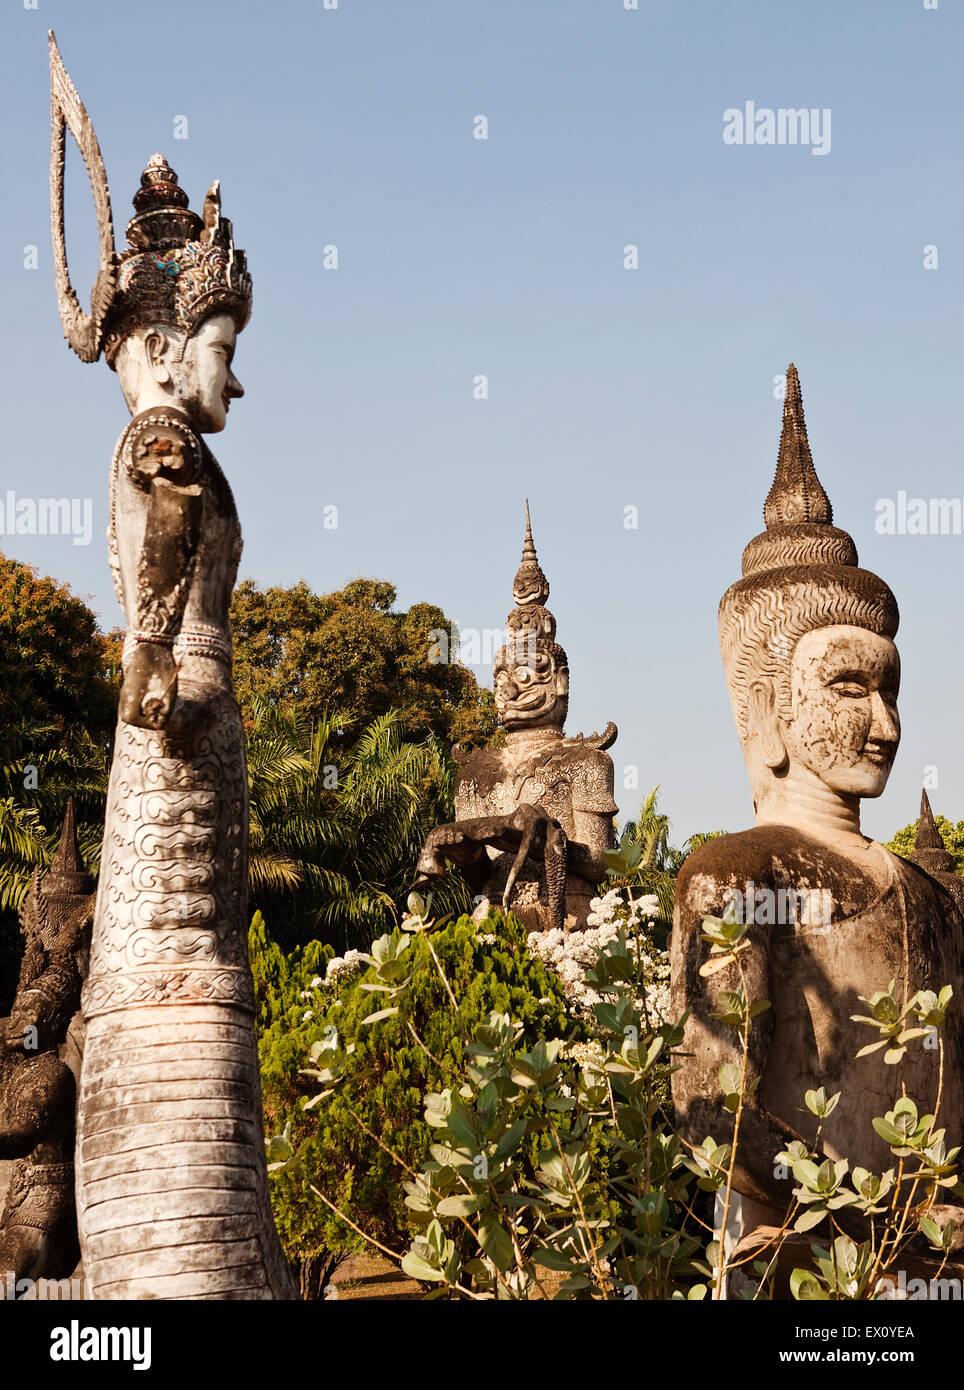 Concrete statues in Xieng Khuan (Buddha Park), Vientiane, Laos P.D.R. Buddha Park was created by Luang Pou Bounlua - Stock Image